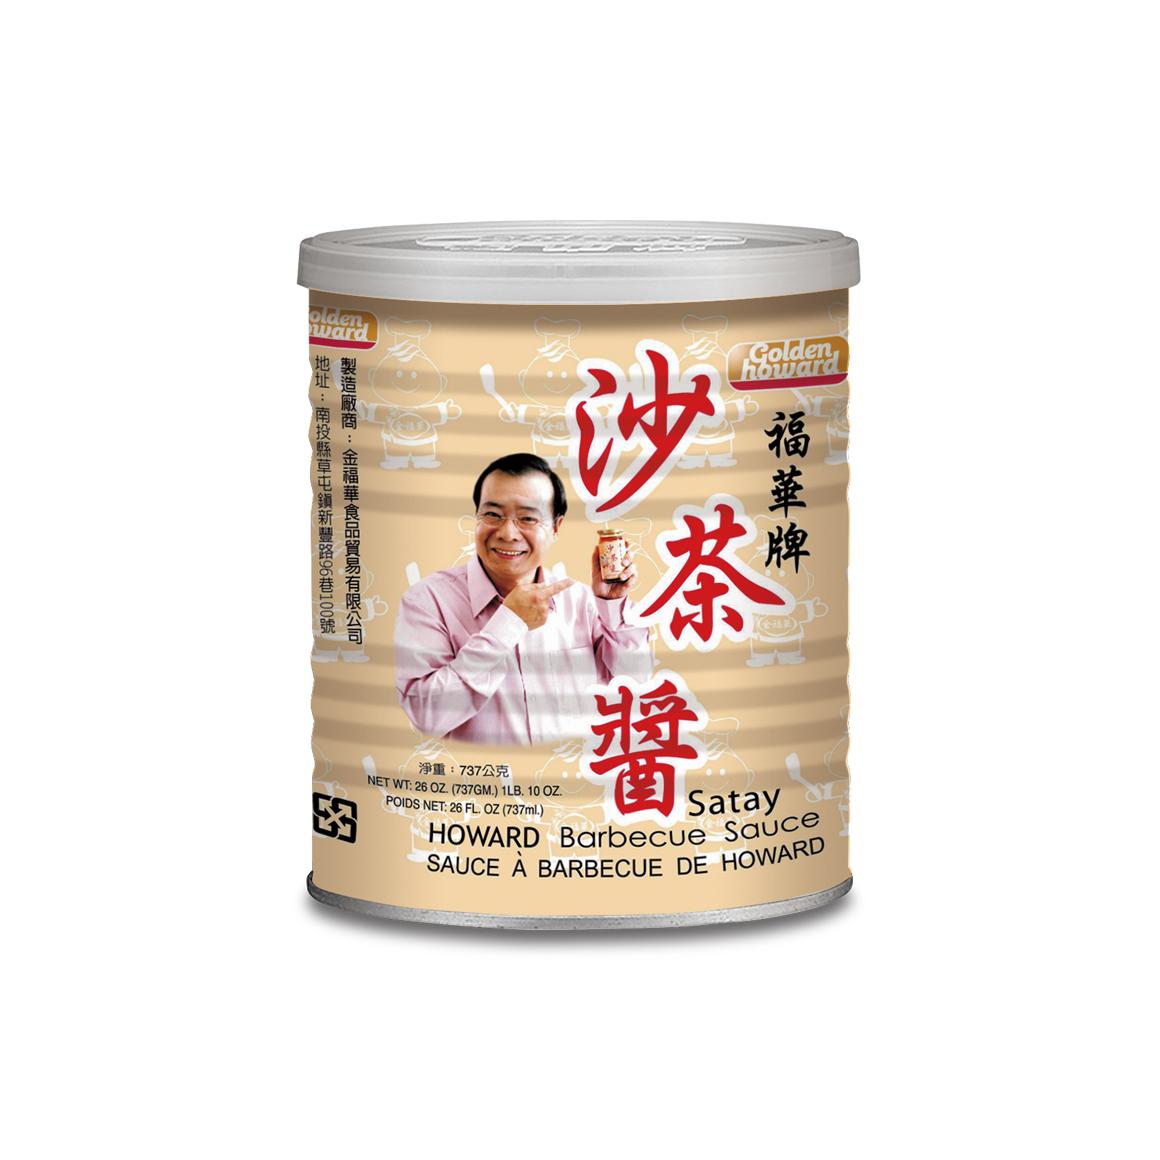 20200526-B104福華牌沙茶醬737g-罐裝易開+廖俊-官網1160x1160